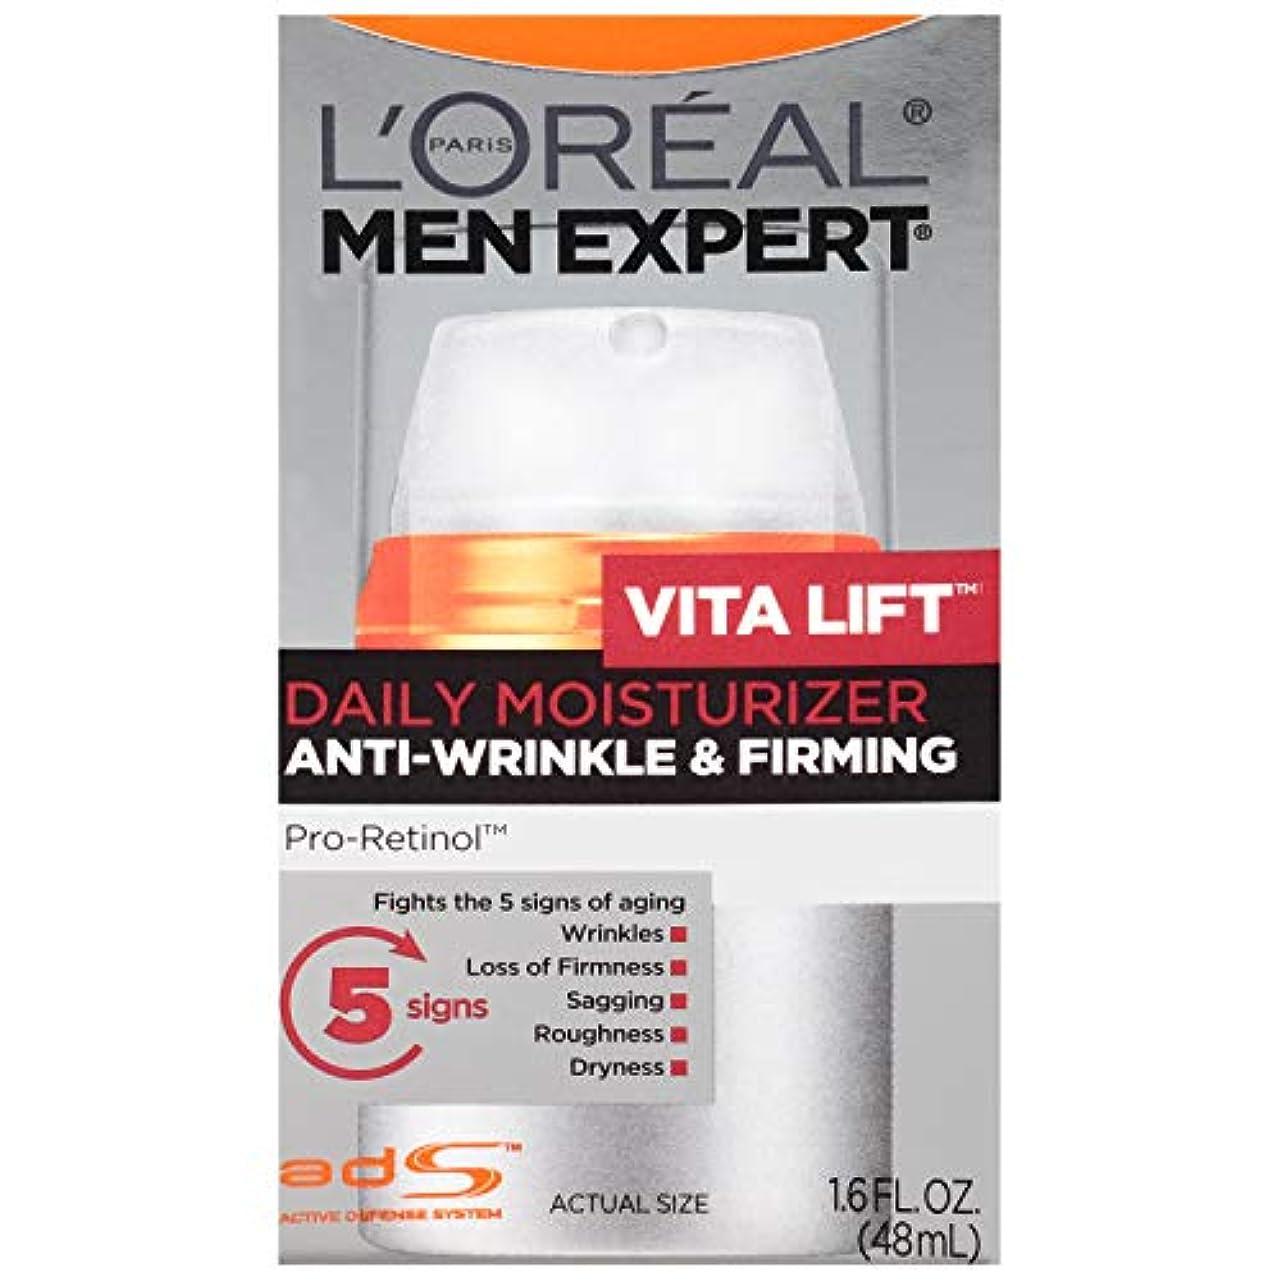 Men's Expert L'Oreal Paris Vita Lift Anti-Wrinkle & Firming Moisturizer, 1.6 Ounces